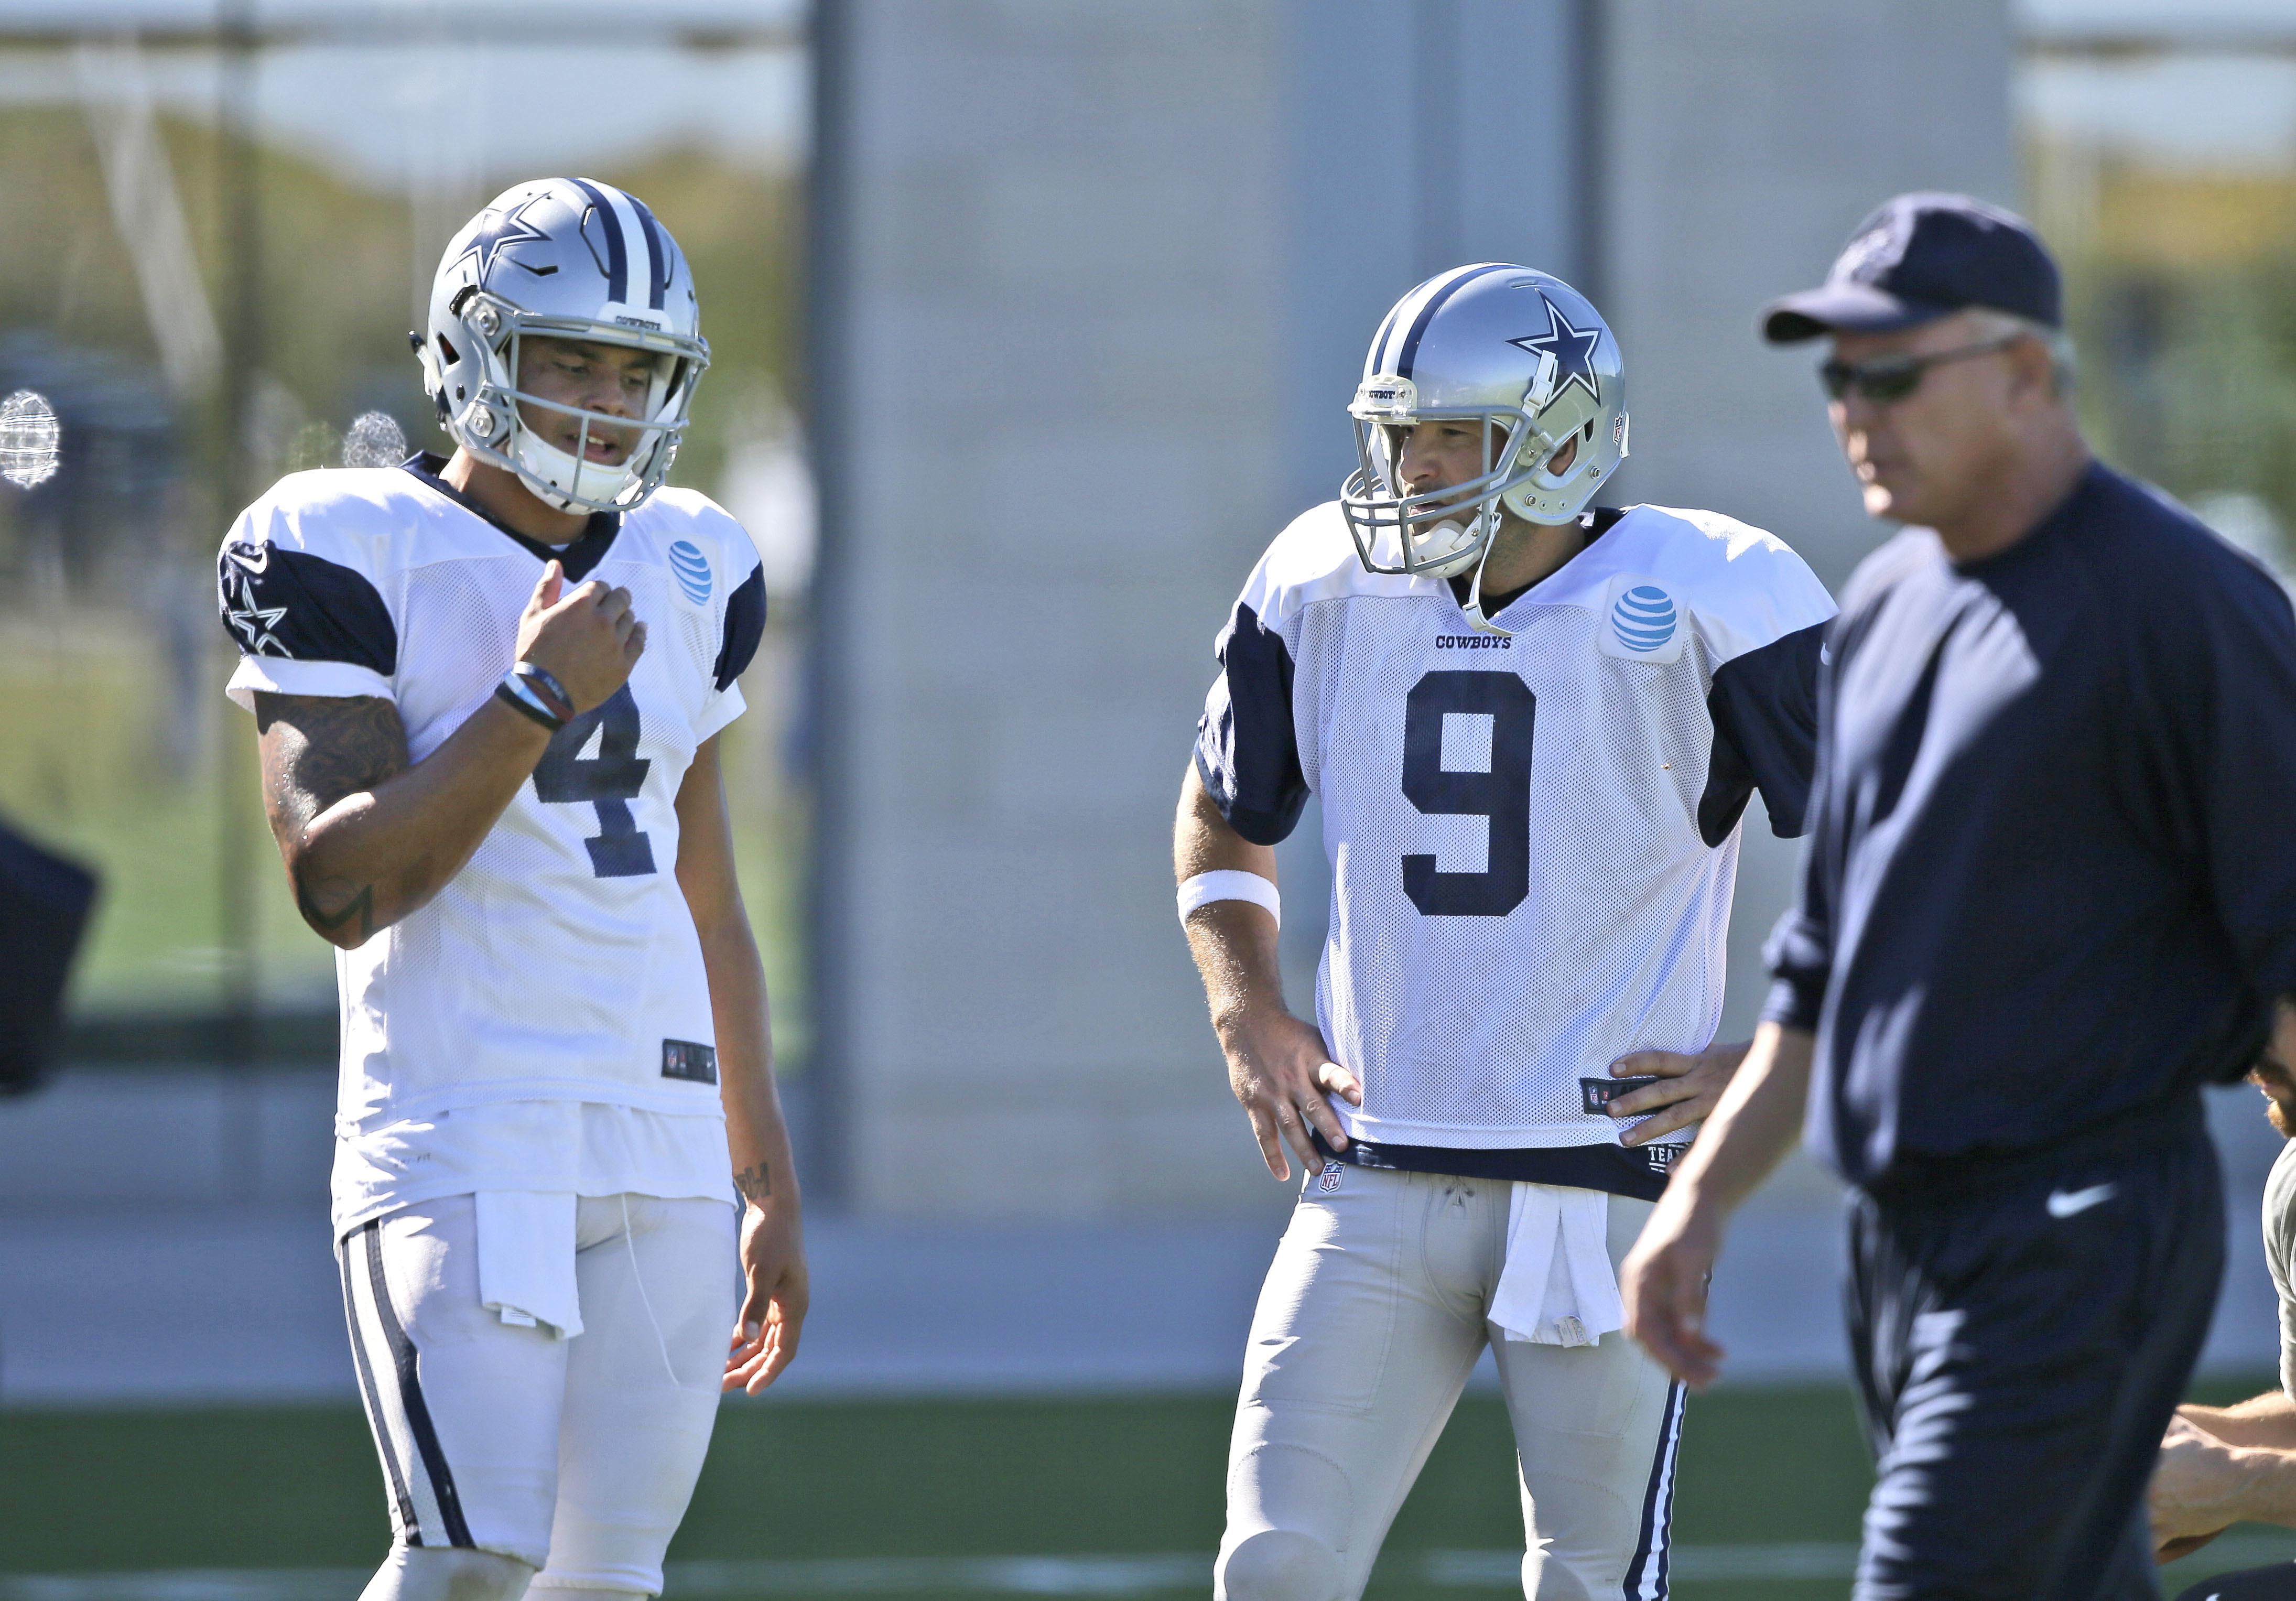 Dallas Cowboys starting quarterback Dak Prescott (4) and backup quarterback Tony Romo stand on the field during an NFL football team practice in Frisco, Texas, Wednesday, Nov. 16, 2016. Prescott frequently said the Dallas Cowboys were still Romo's team ev